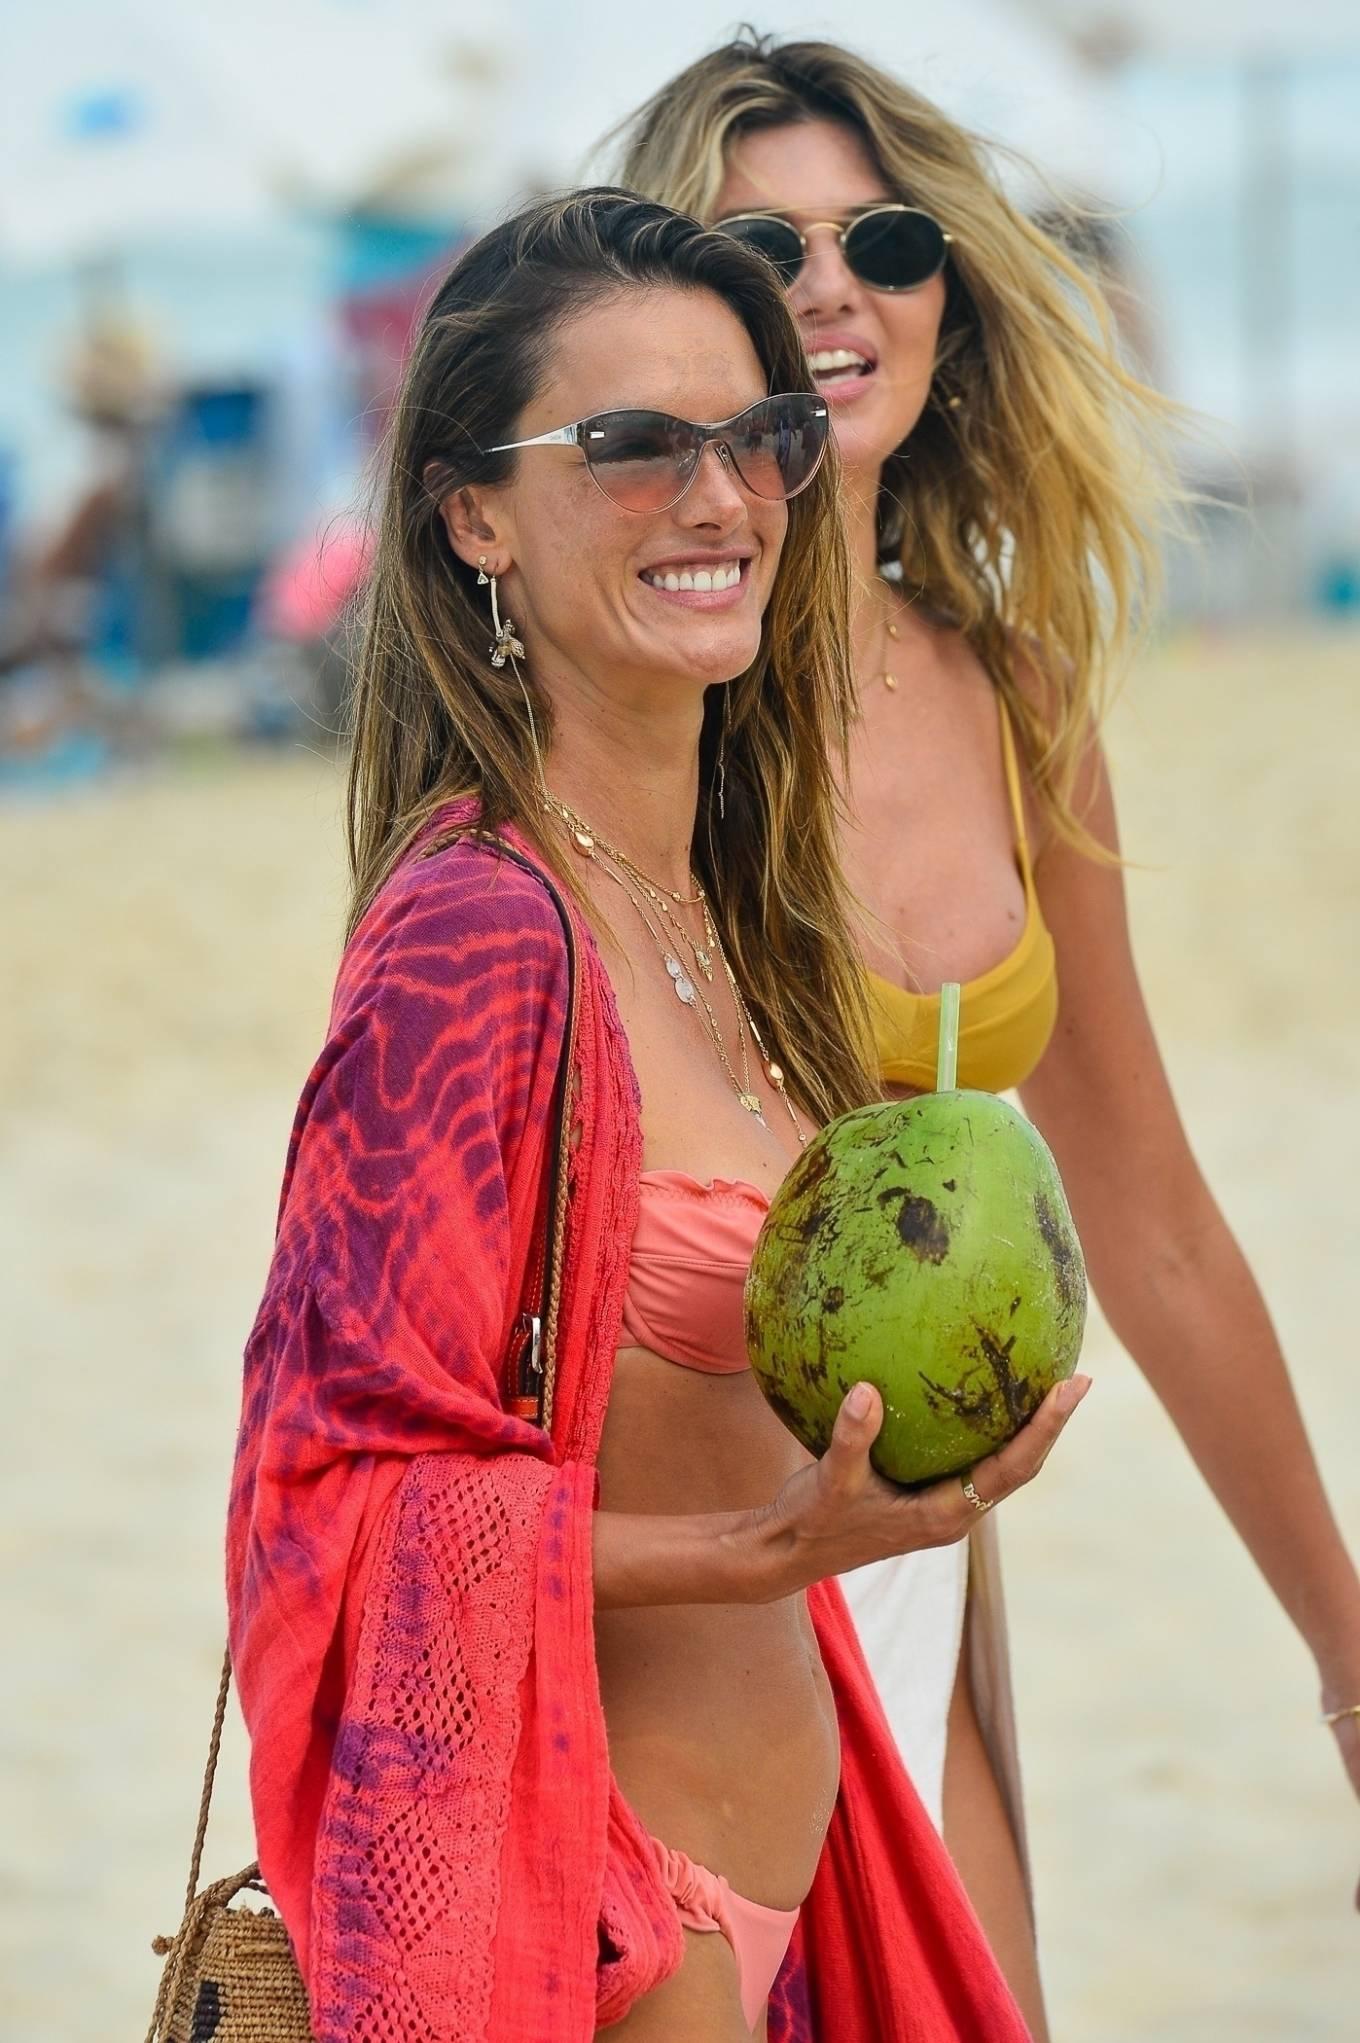 Alessandra Ambrosio - In a pink bikini on the beach in Brazil